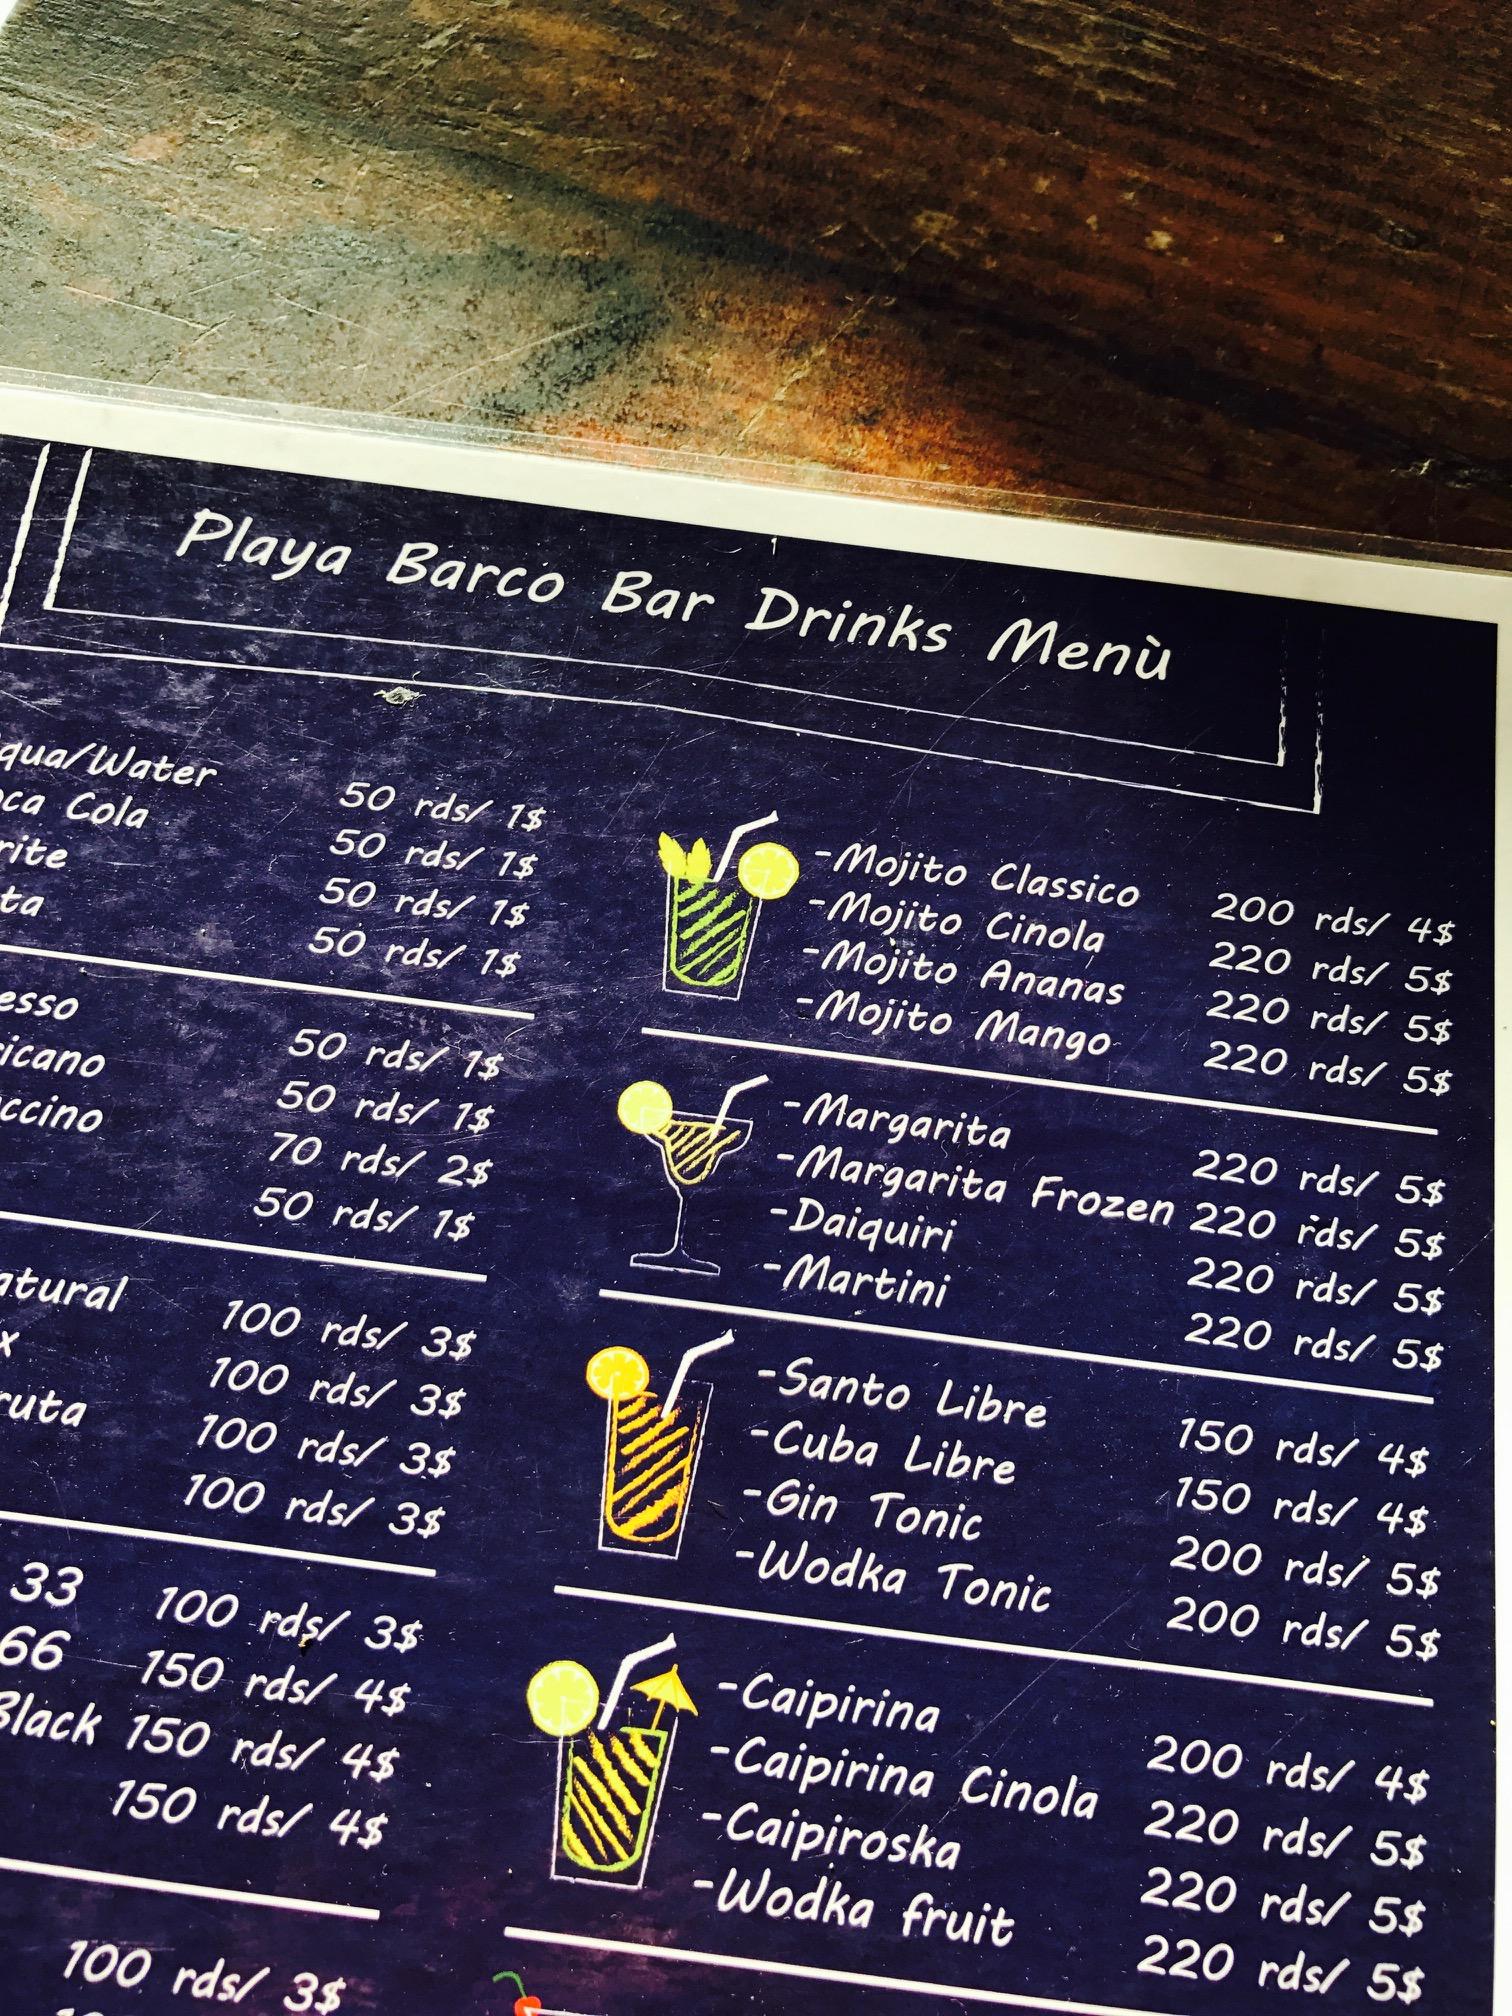 Getränkekarte der Playa Barco Bar